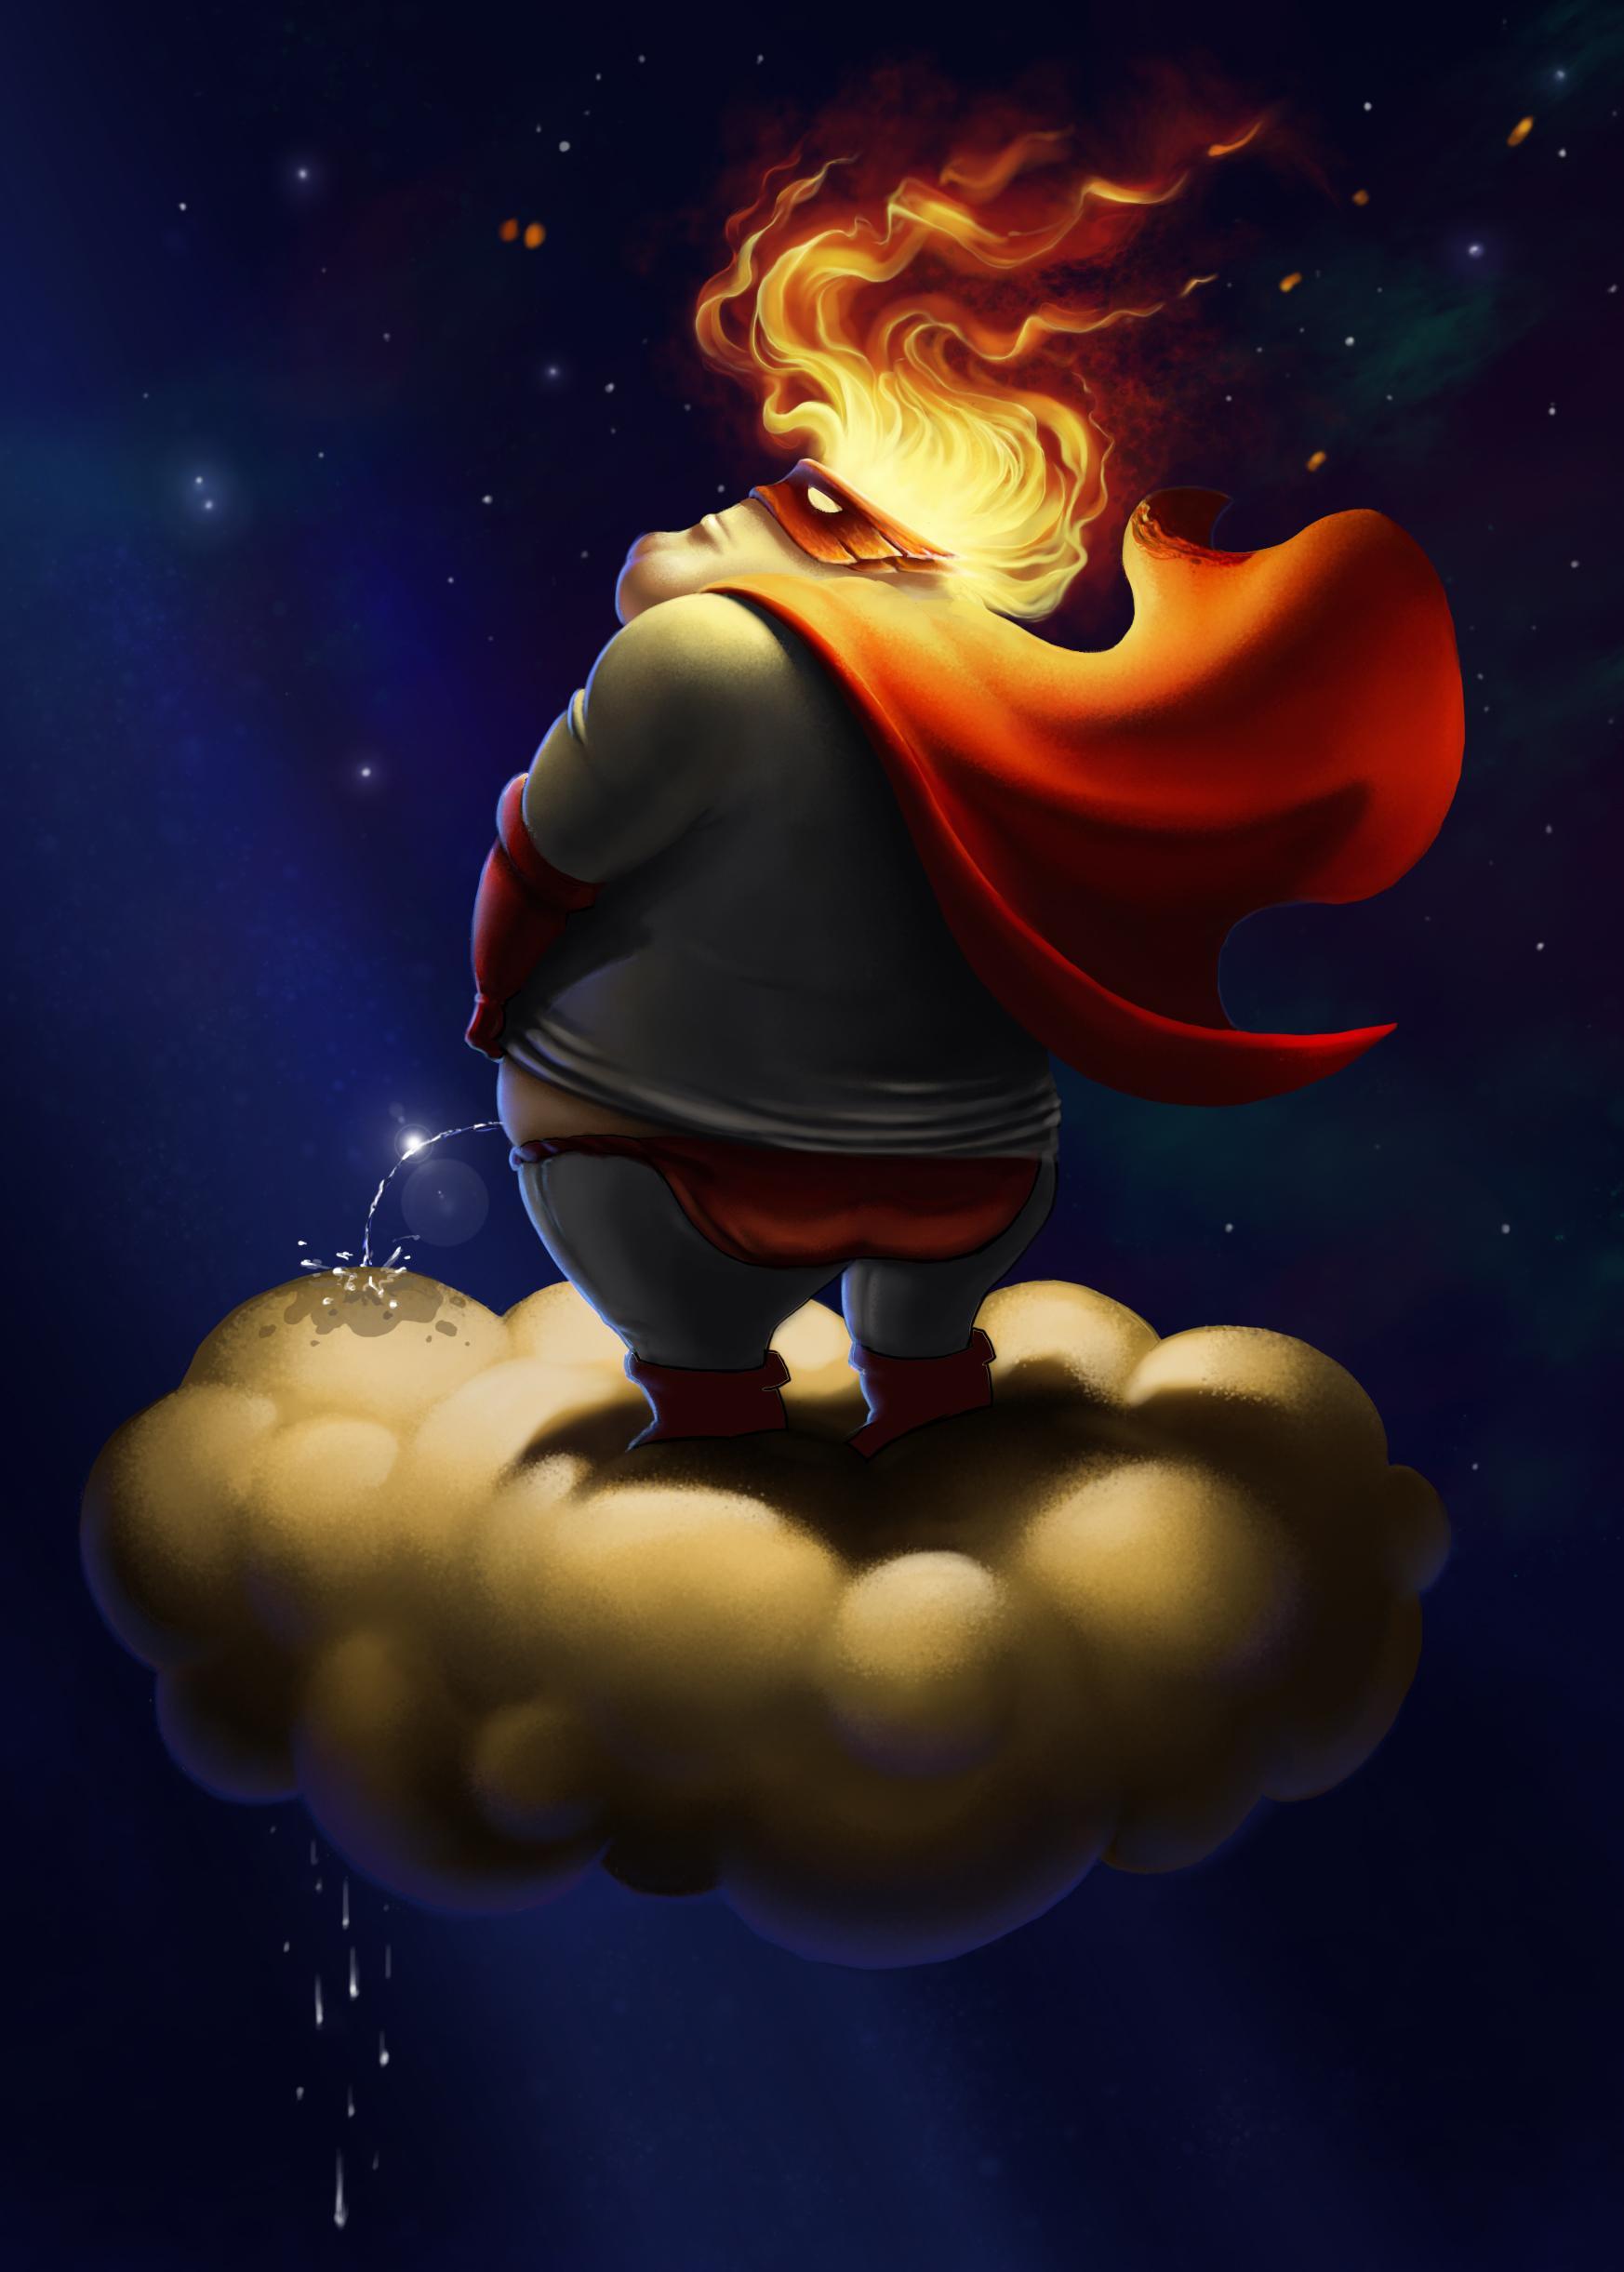 Evil Super hero - image 2 - student project